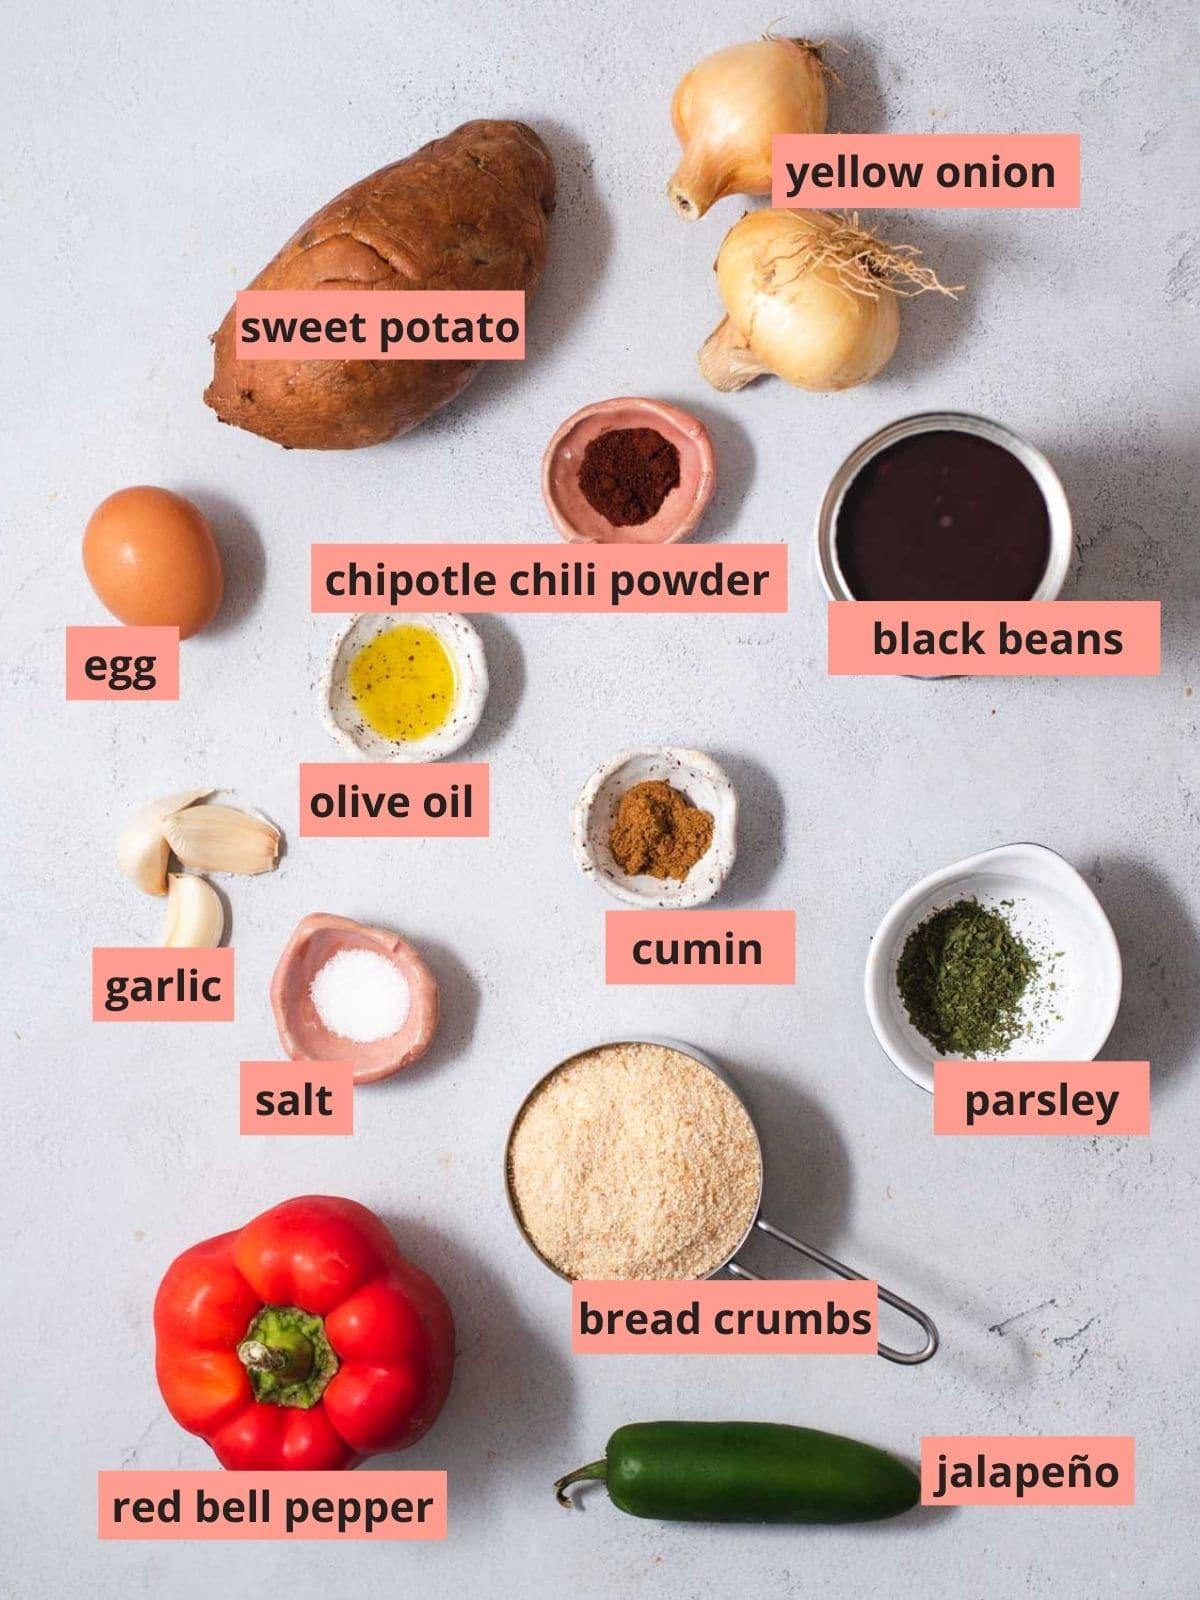 Labeled ingredients used to make black bean burgers